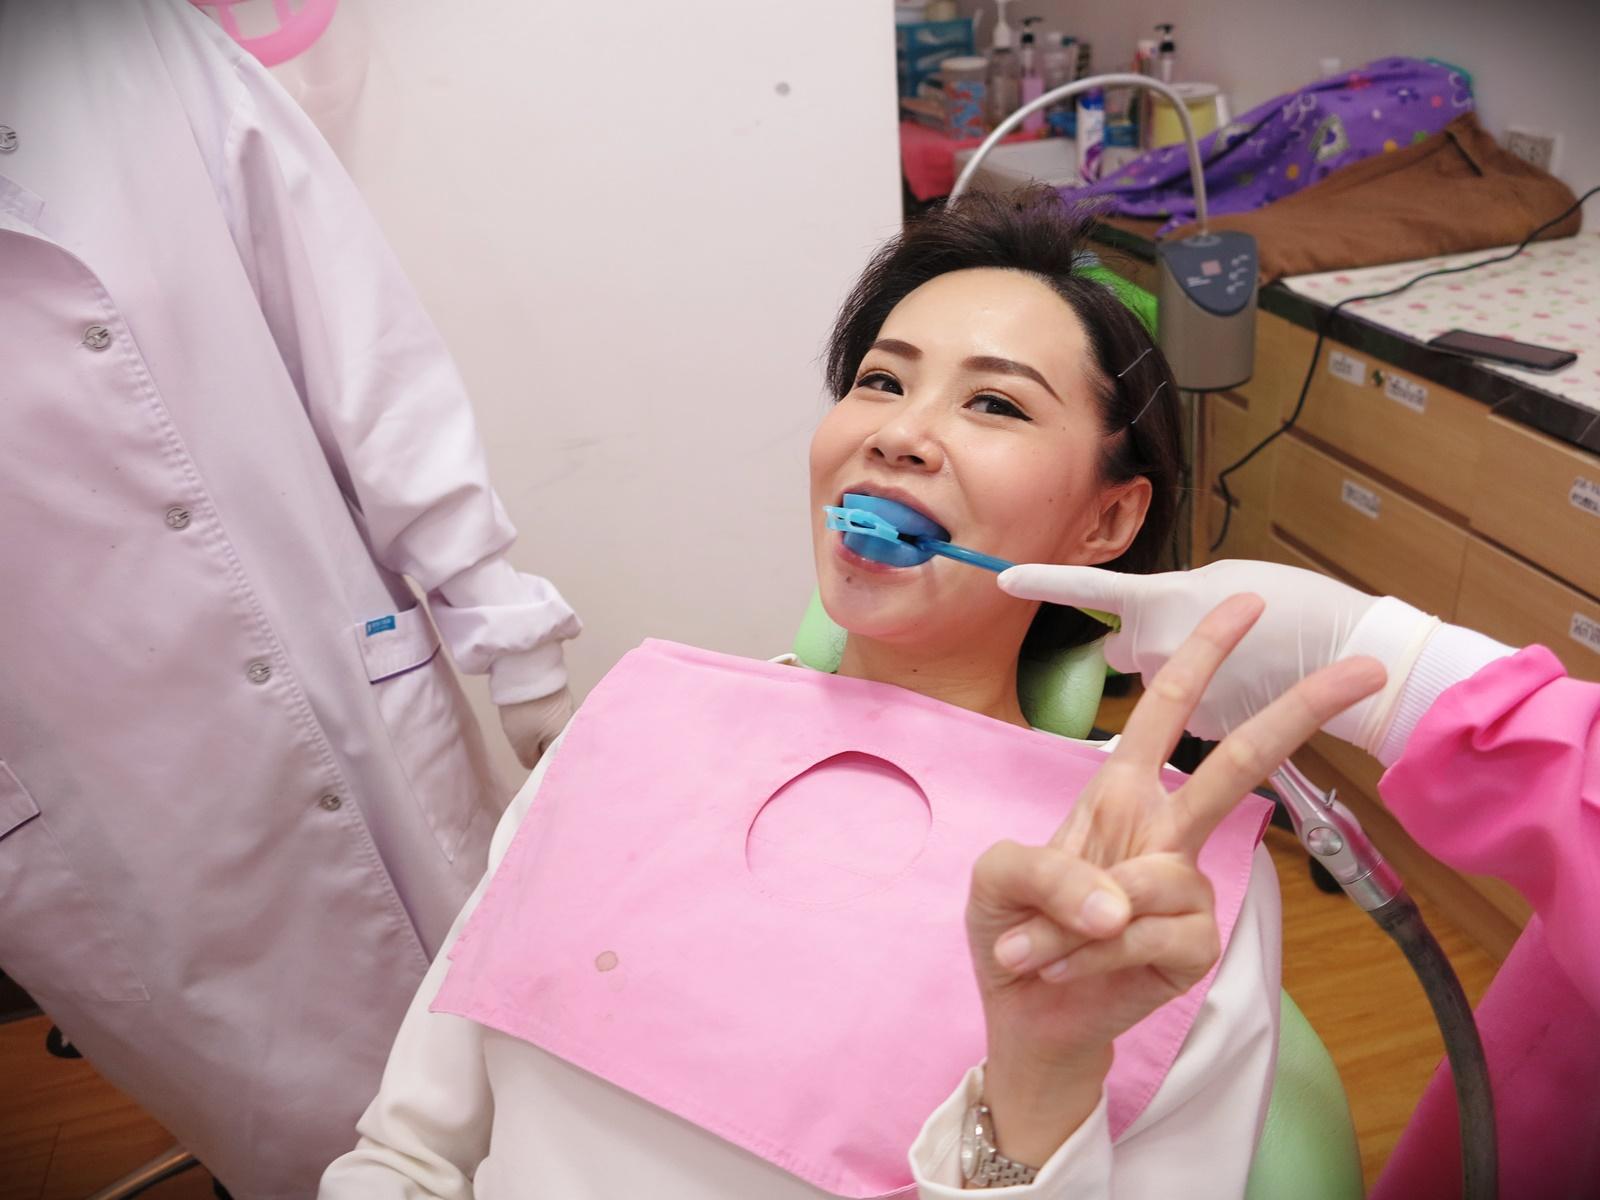 Cosmetic,Dentistry,thailand,bangkok,กรุงเทพ,ทันตกรรมความงาม,เคลือบ,ฟูลออไรด์,Dental,Smart,Clinic,dentalsmartclinic, รีวิว,ฟัน,ขาว,Cool Light,ฟอกสีฟัน,หมอแพรว,คลินิก,ทันตกรรม, เด็นทอลสมาร์ท,เดอะไนท์,เซ็นเตอร์,พระราม9,The Nine,Rama9, โปรโมชั่น,ฟอกฟันขาว,ฟอก,สีฟัน,ยิ้มสวย,ฟันเหลือง,เขรอะ,ฟันขาว,สะอาด,   ประสบการณ์,เร่ง,ด่วน,เห็นผล,ทันตแพทย์,หมอฟัน,ตรวจ, ซื้อ,น้ำยา,ฟันด่าง,บูลไลท์,Blue Light,เหลือง,สะสม,หมอง,ด้วยตัวเอง,เอง,ที่บ้าน, เสียวฟัน,ยาสีฟัน,ชุดเจล,ผงขัดฟัน,สูงอายุ,คนแก่,แสงเย็น,Cool,light,whitening, ถูก,ขาวขึ้น,สาเหตุ,ฟันตาย,คล้ำ,In-office,tooth,Laser,เลเซอร์,คูลไลท์,Home,bleaching, ผล,ถาวร,  ข้อดี,ง่าย,เร็ว,วีเนียร์,Veneer,โรคเหงือก,ฟันเสื่อม,ฟันผุ,ครอบฟัน,เตรียมตัว,ก่อนทำ,หลังทำ,ดูแล,ข้อห้าม, แพ้,ฉายแสง,Oral Care,Colgate,Sensitive,Pro-Relief,อาการ,แก้,นานไหม,ราคา,ถาด,ที่ไหนดี,VITA,Toothguide,3D,MASTER,